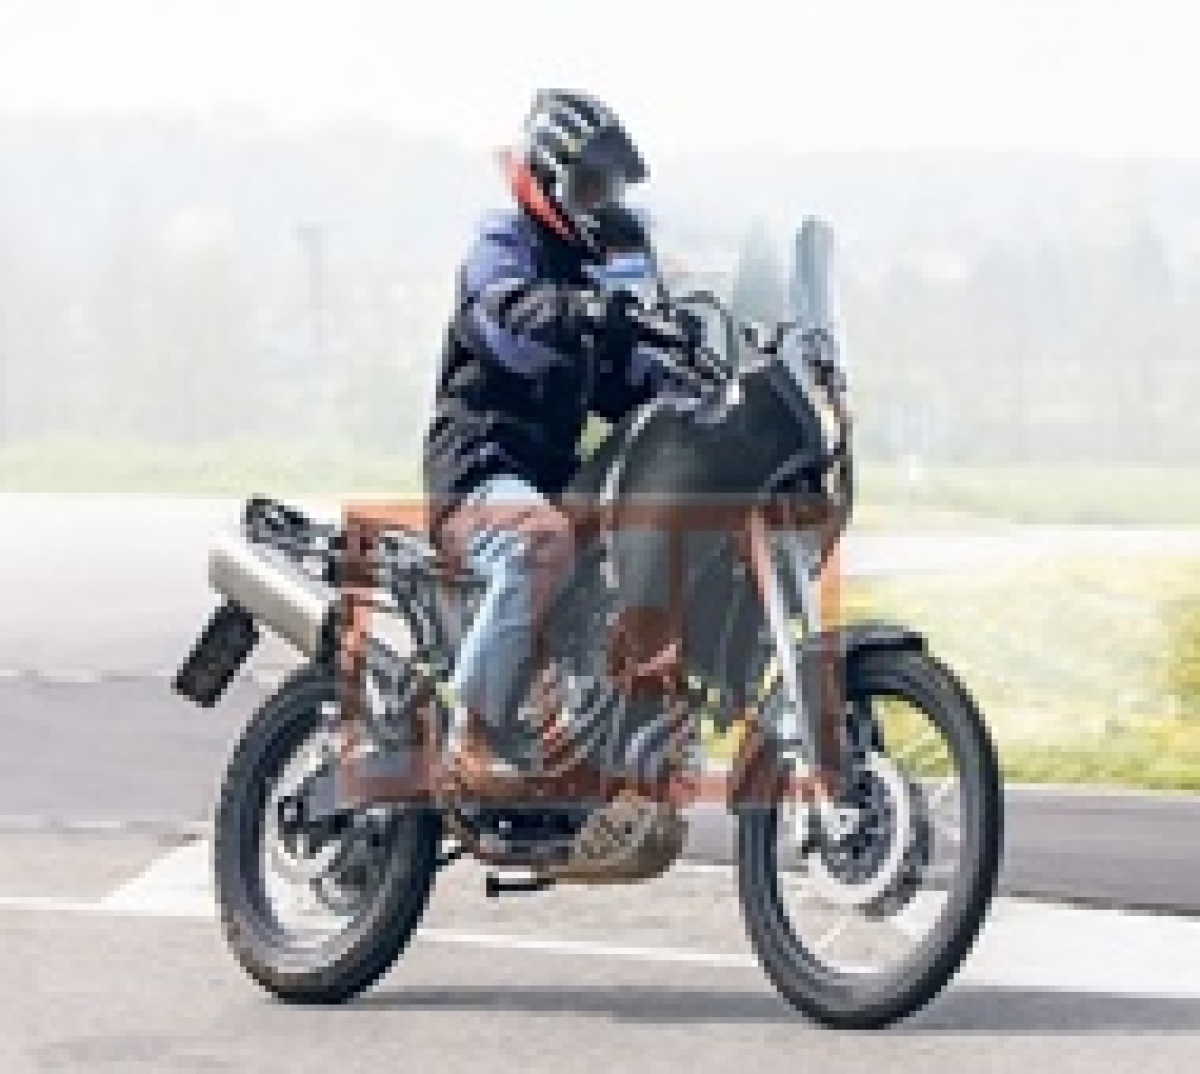 Yamaha MT-07 Tenere adventure tourer spied in Europe